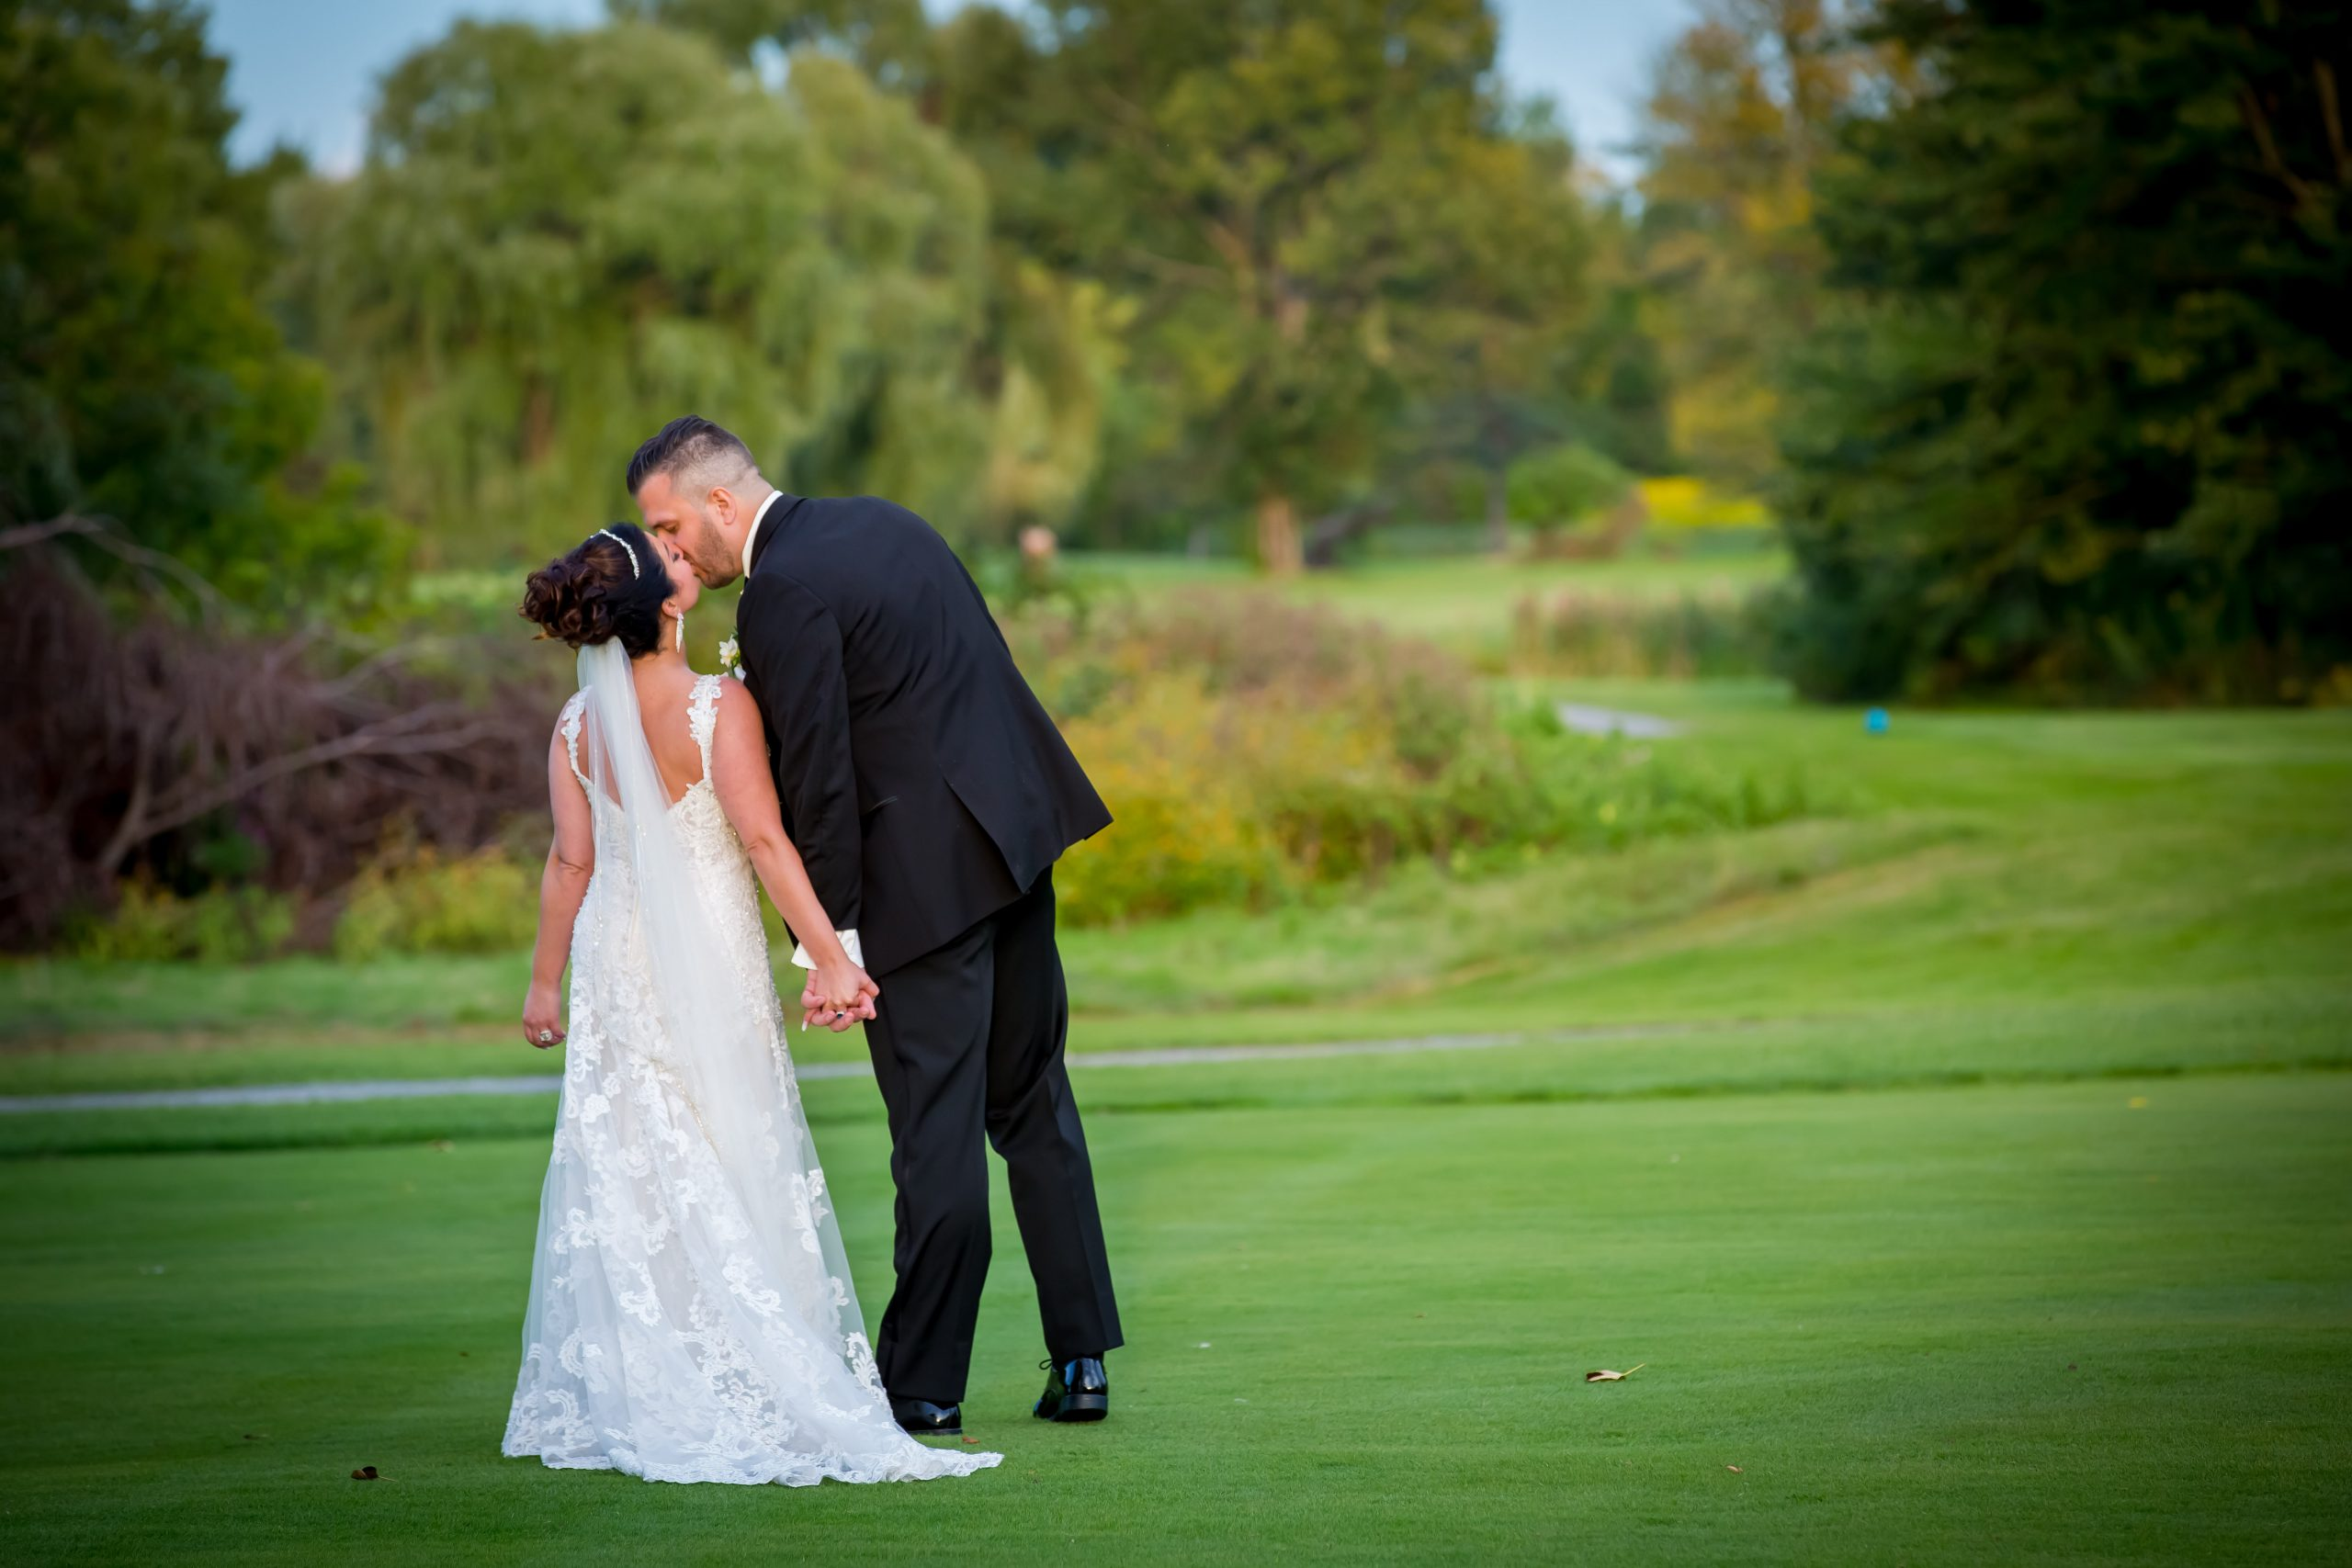 Victori_Rob_Mohawk River Country Club Wedding-38.jpg